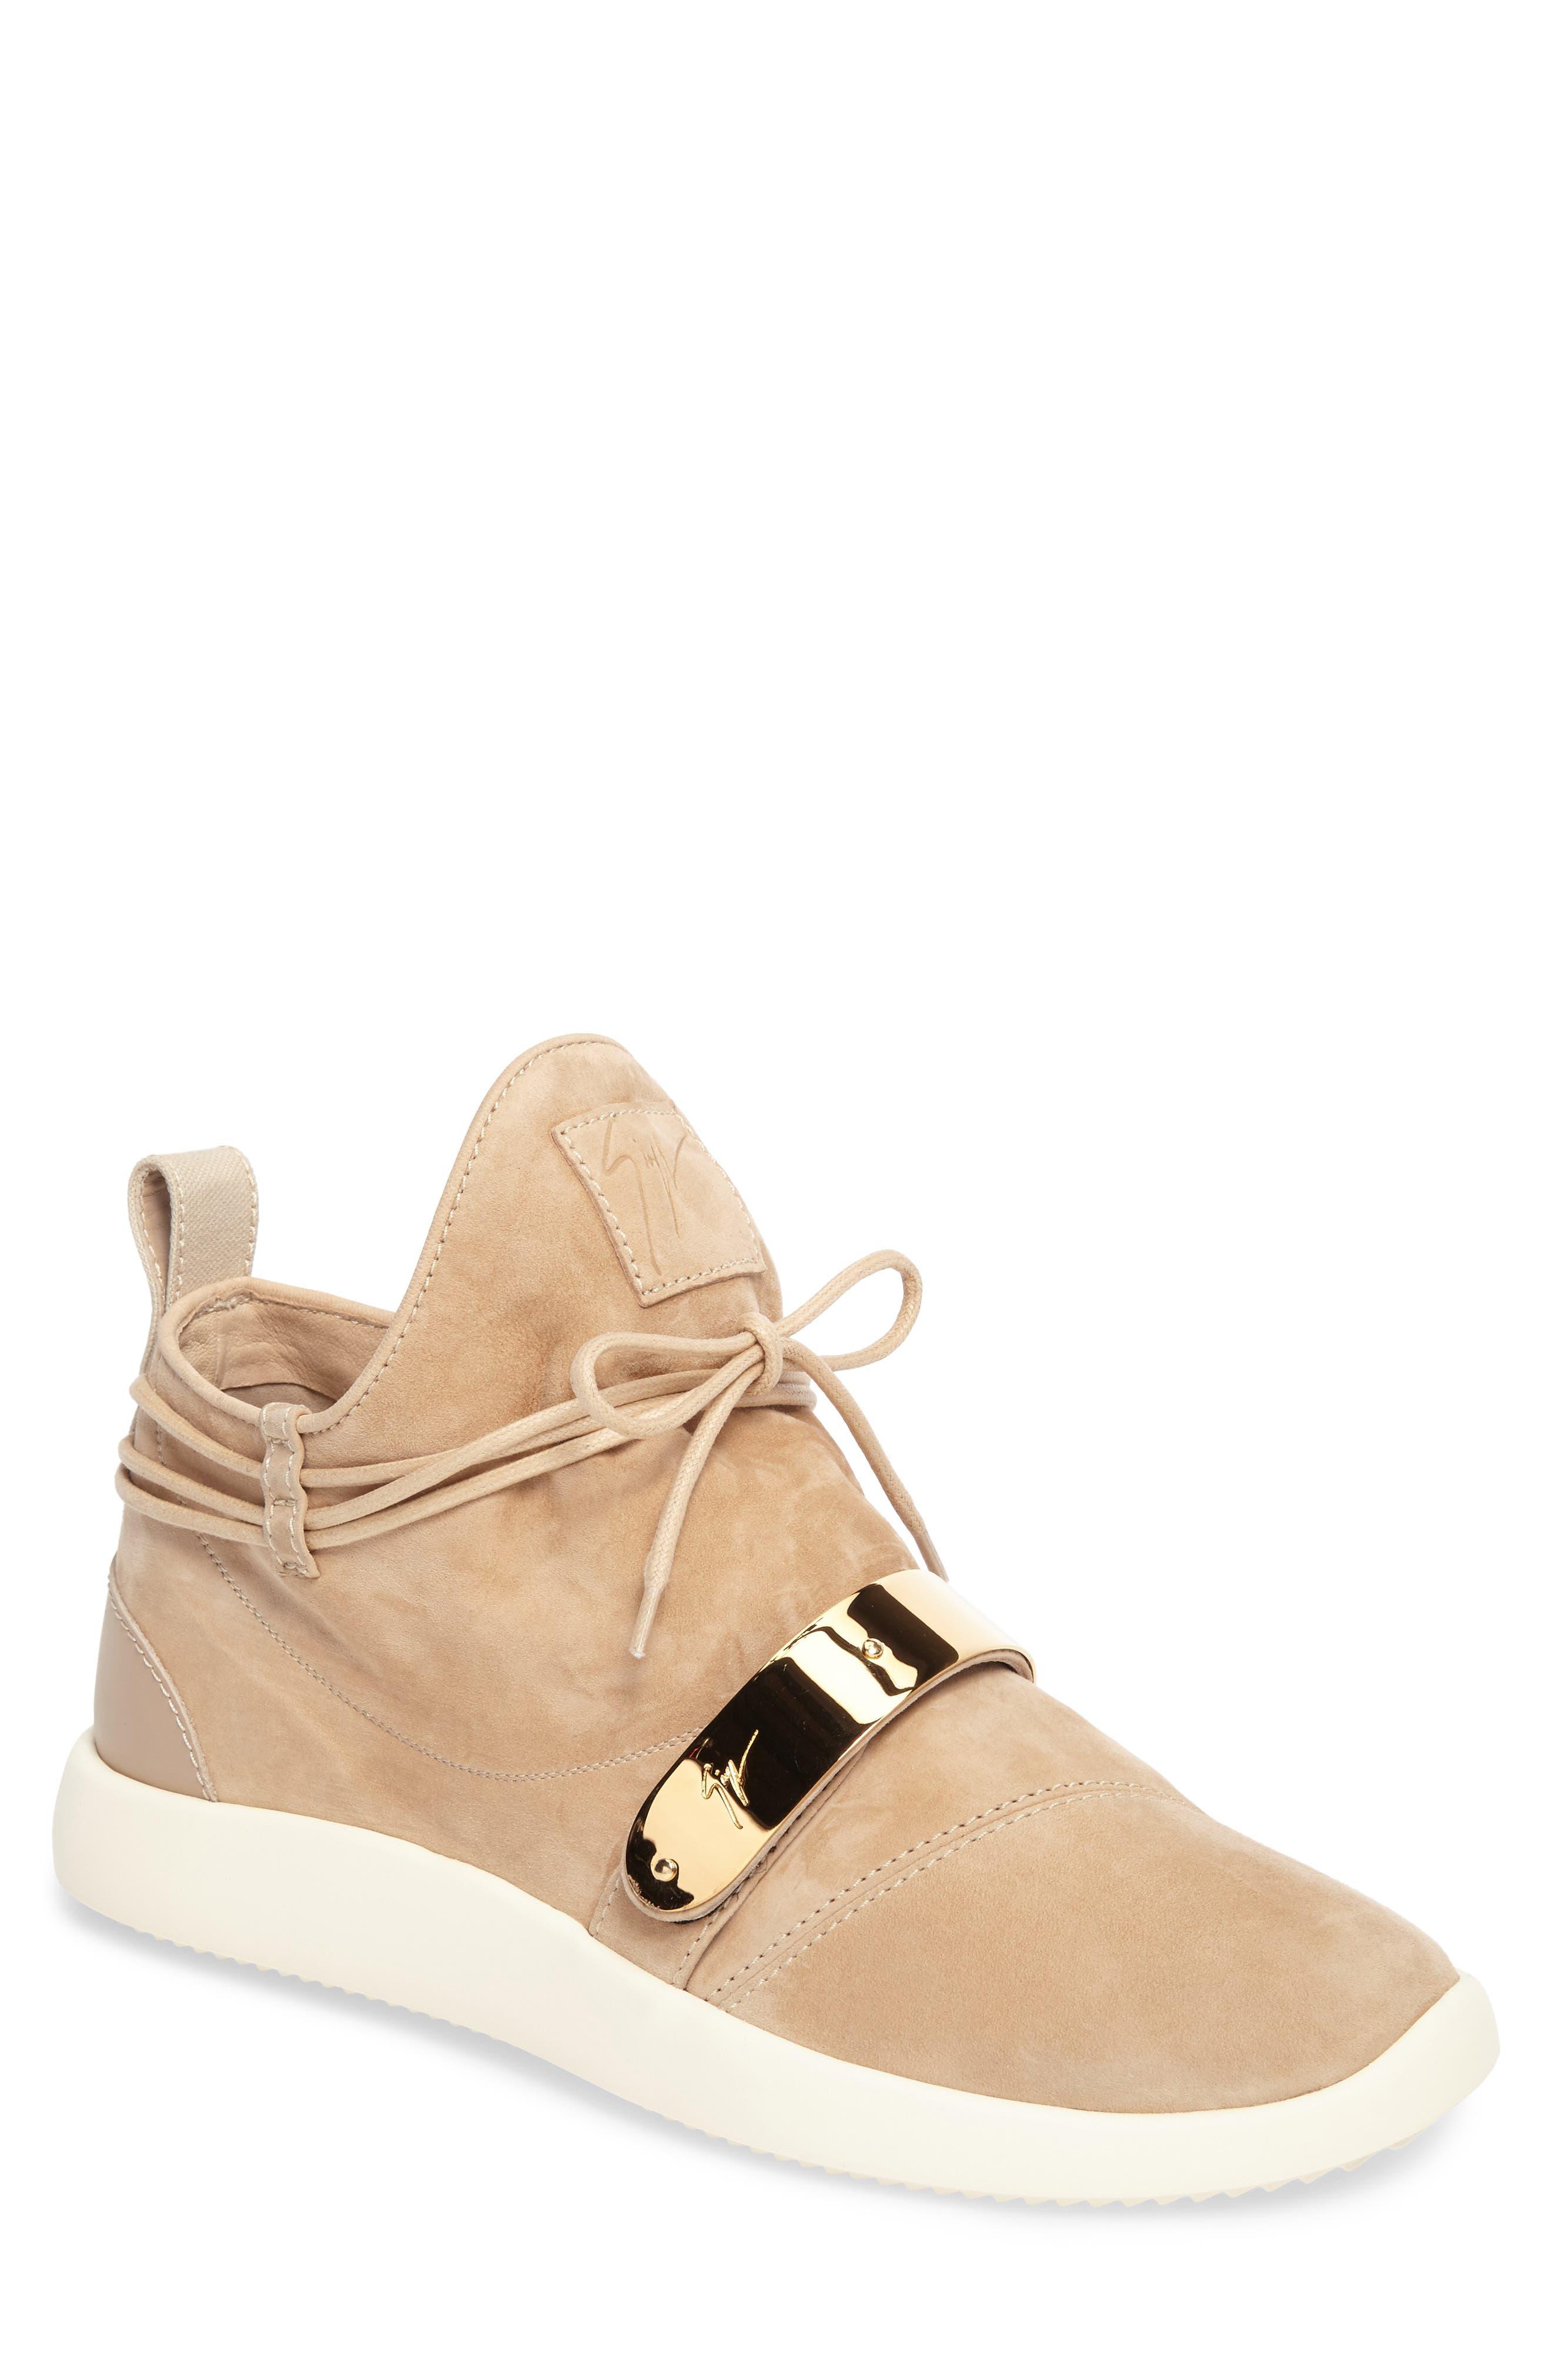 Gold Bar Mid-Top Sneaker,                             Main thumbnail 1, color,                             238